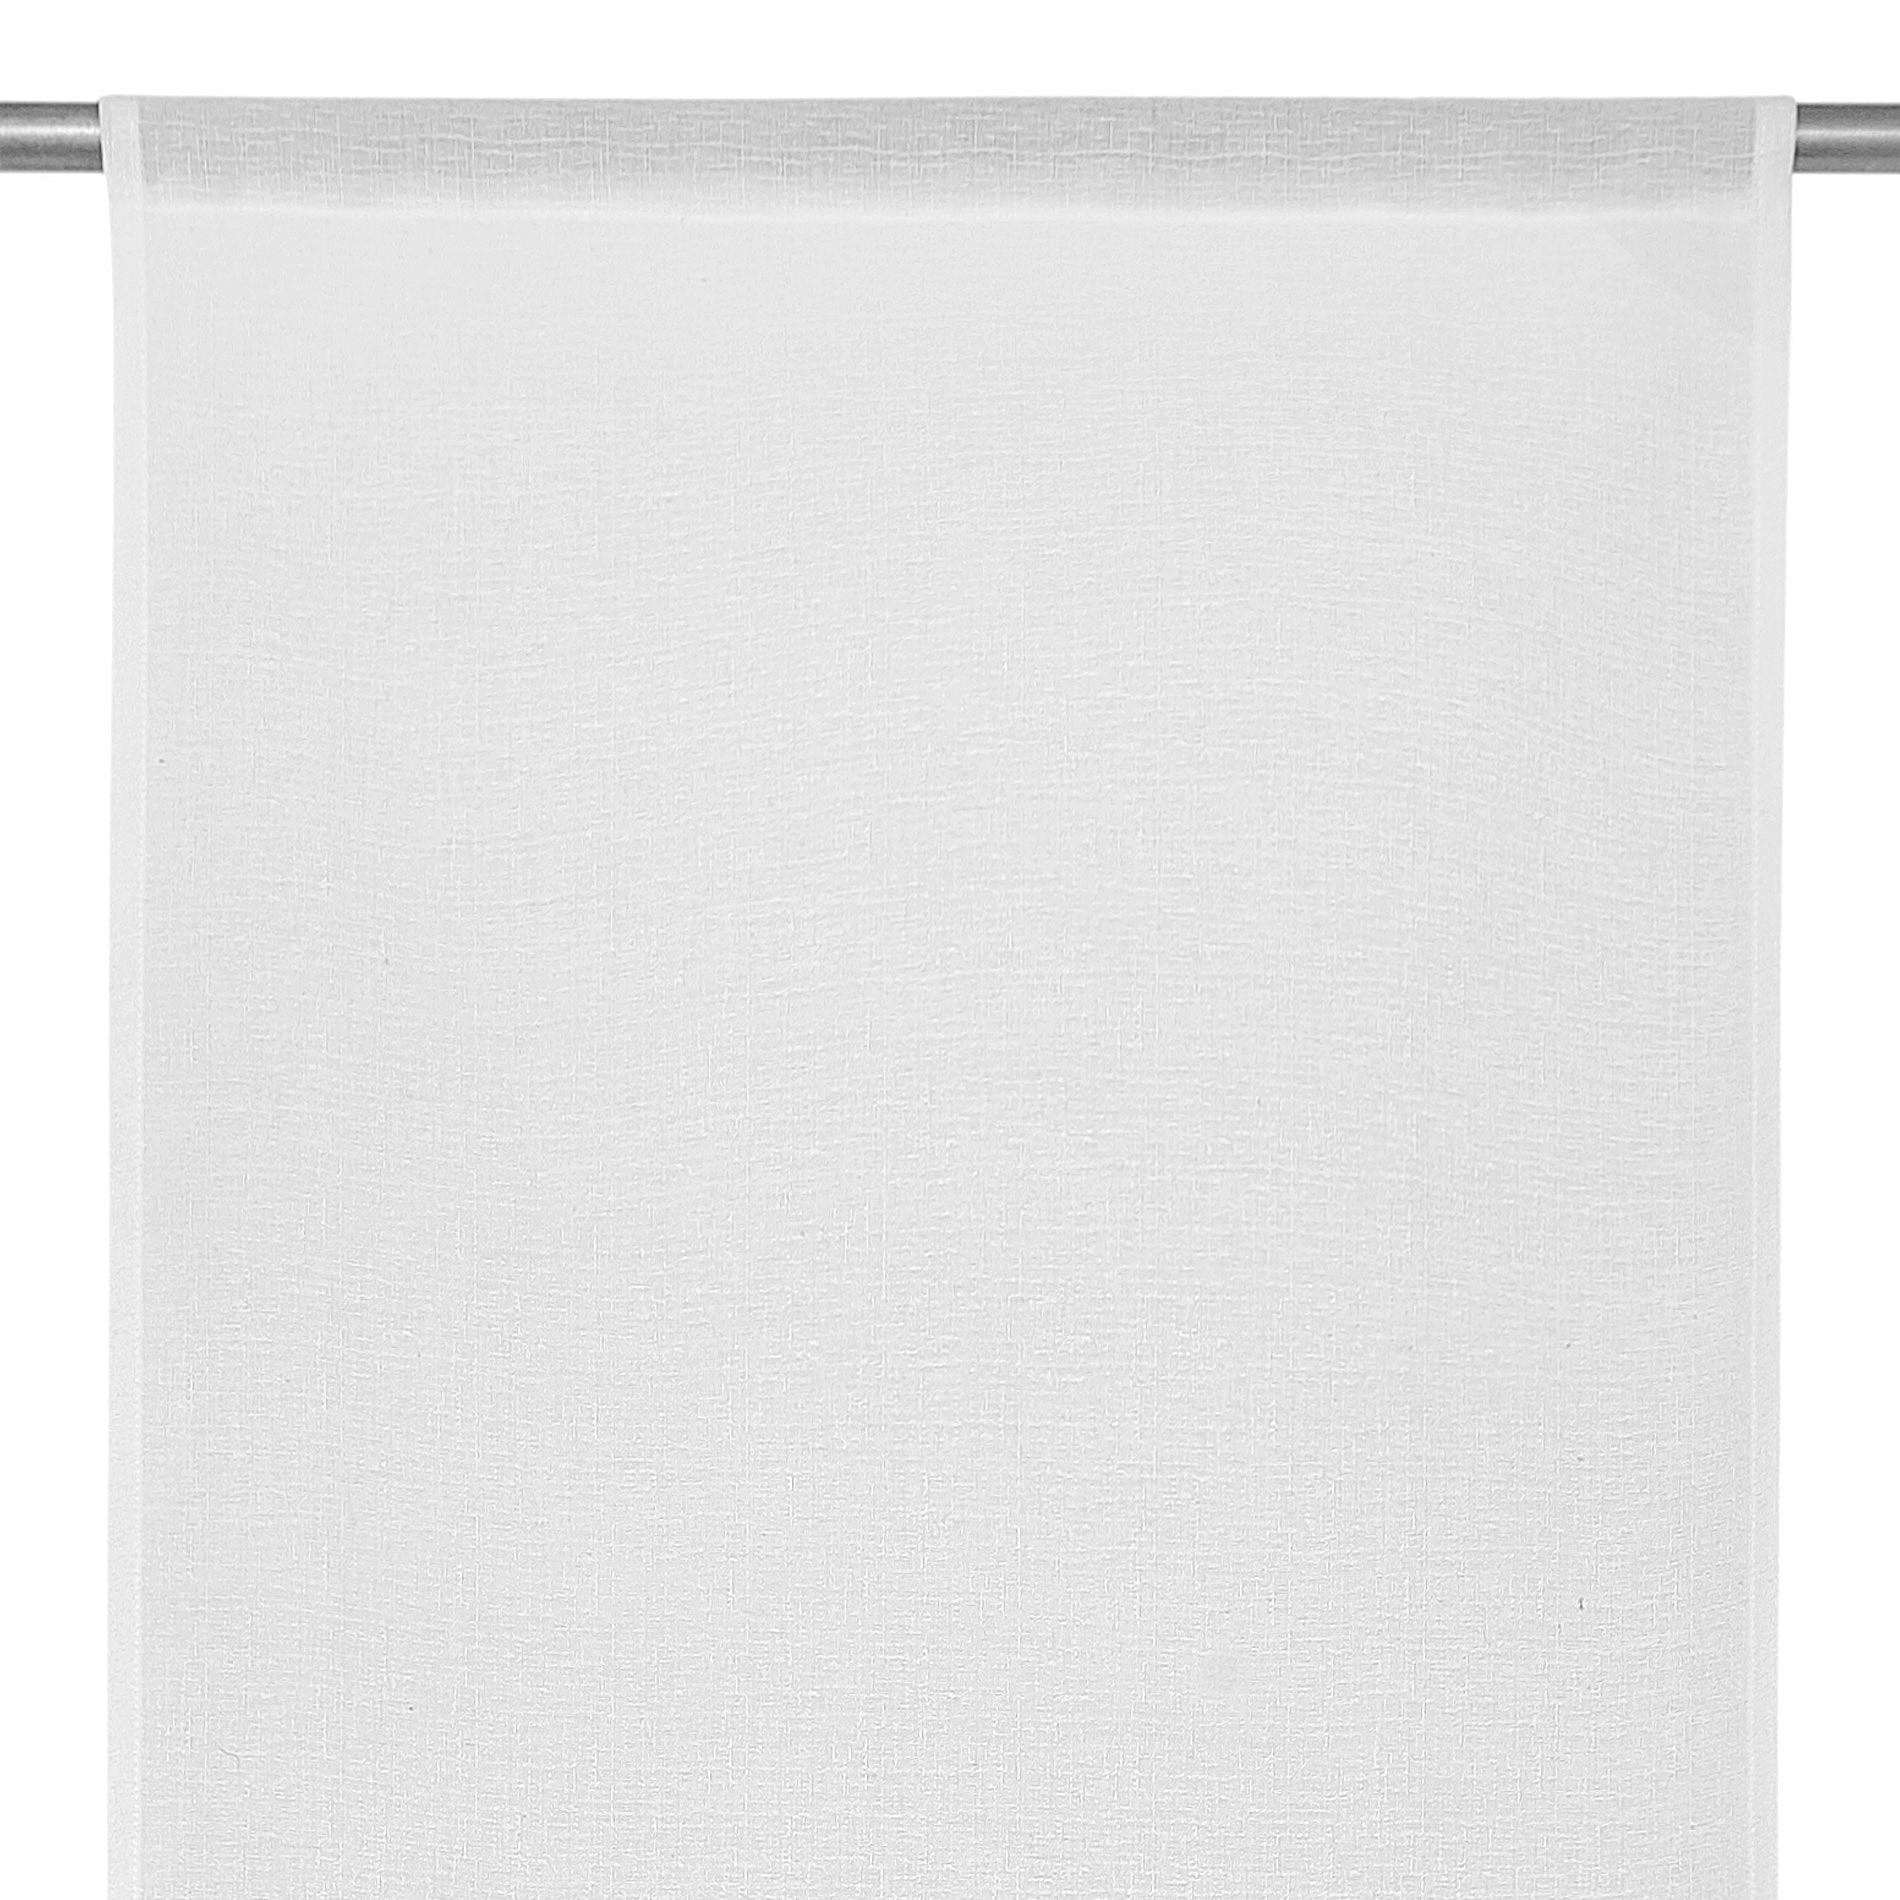 Tendina effetto fiammato tinta unita, Bianco, large image number 2